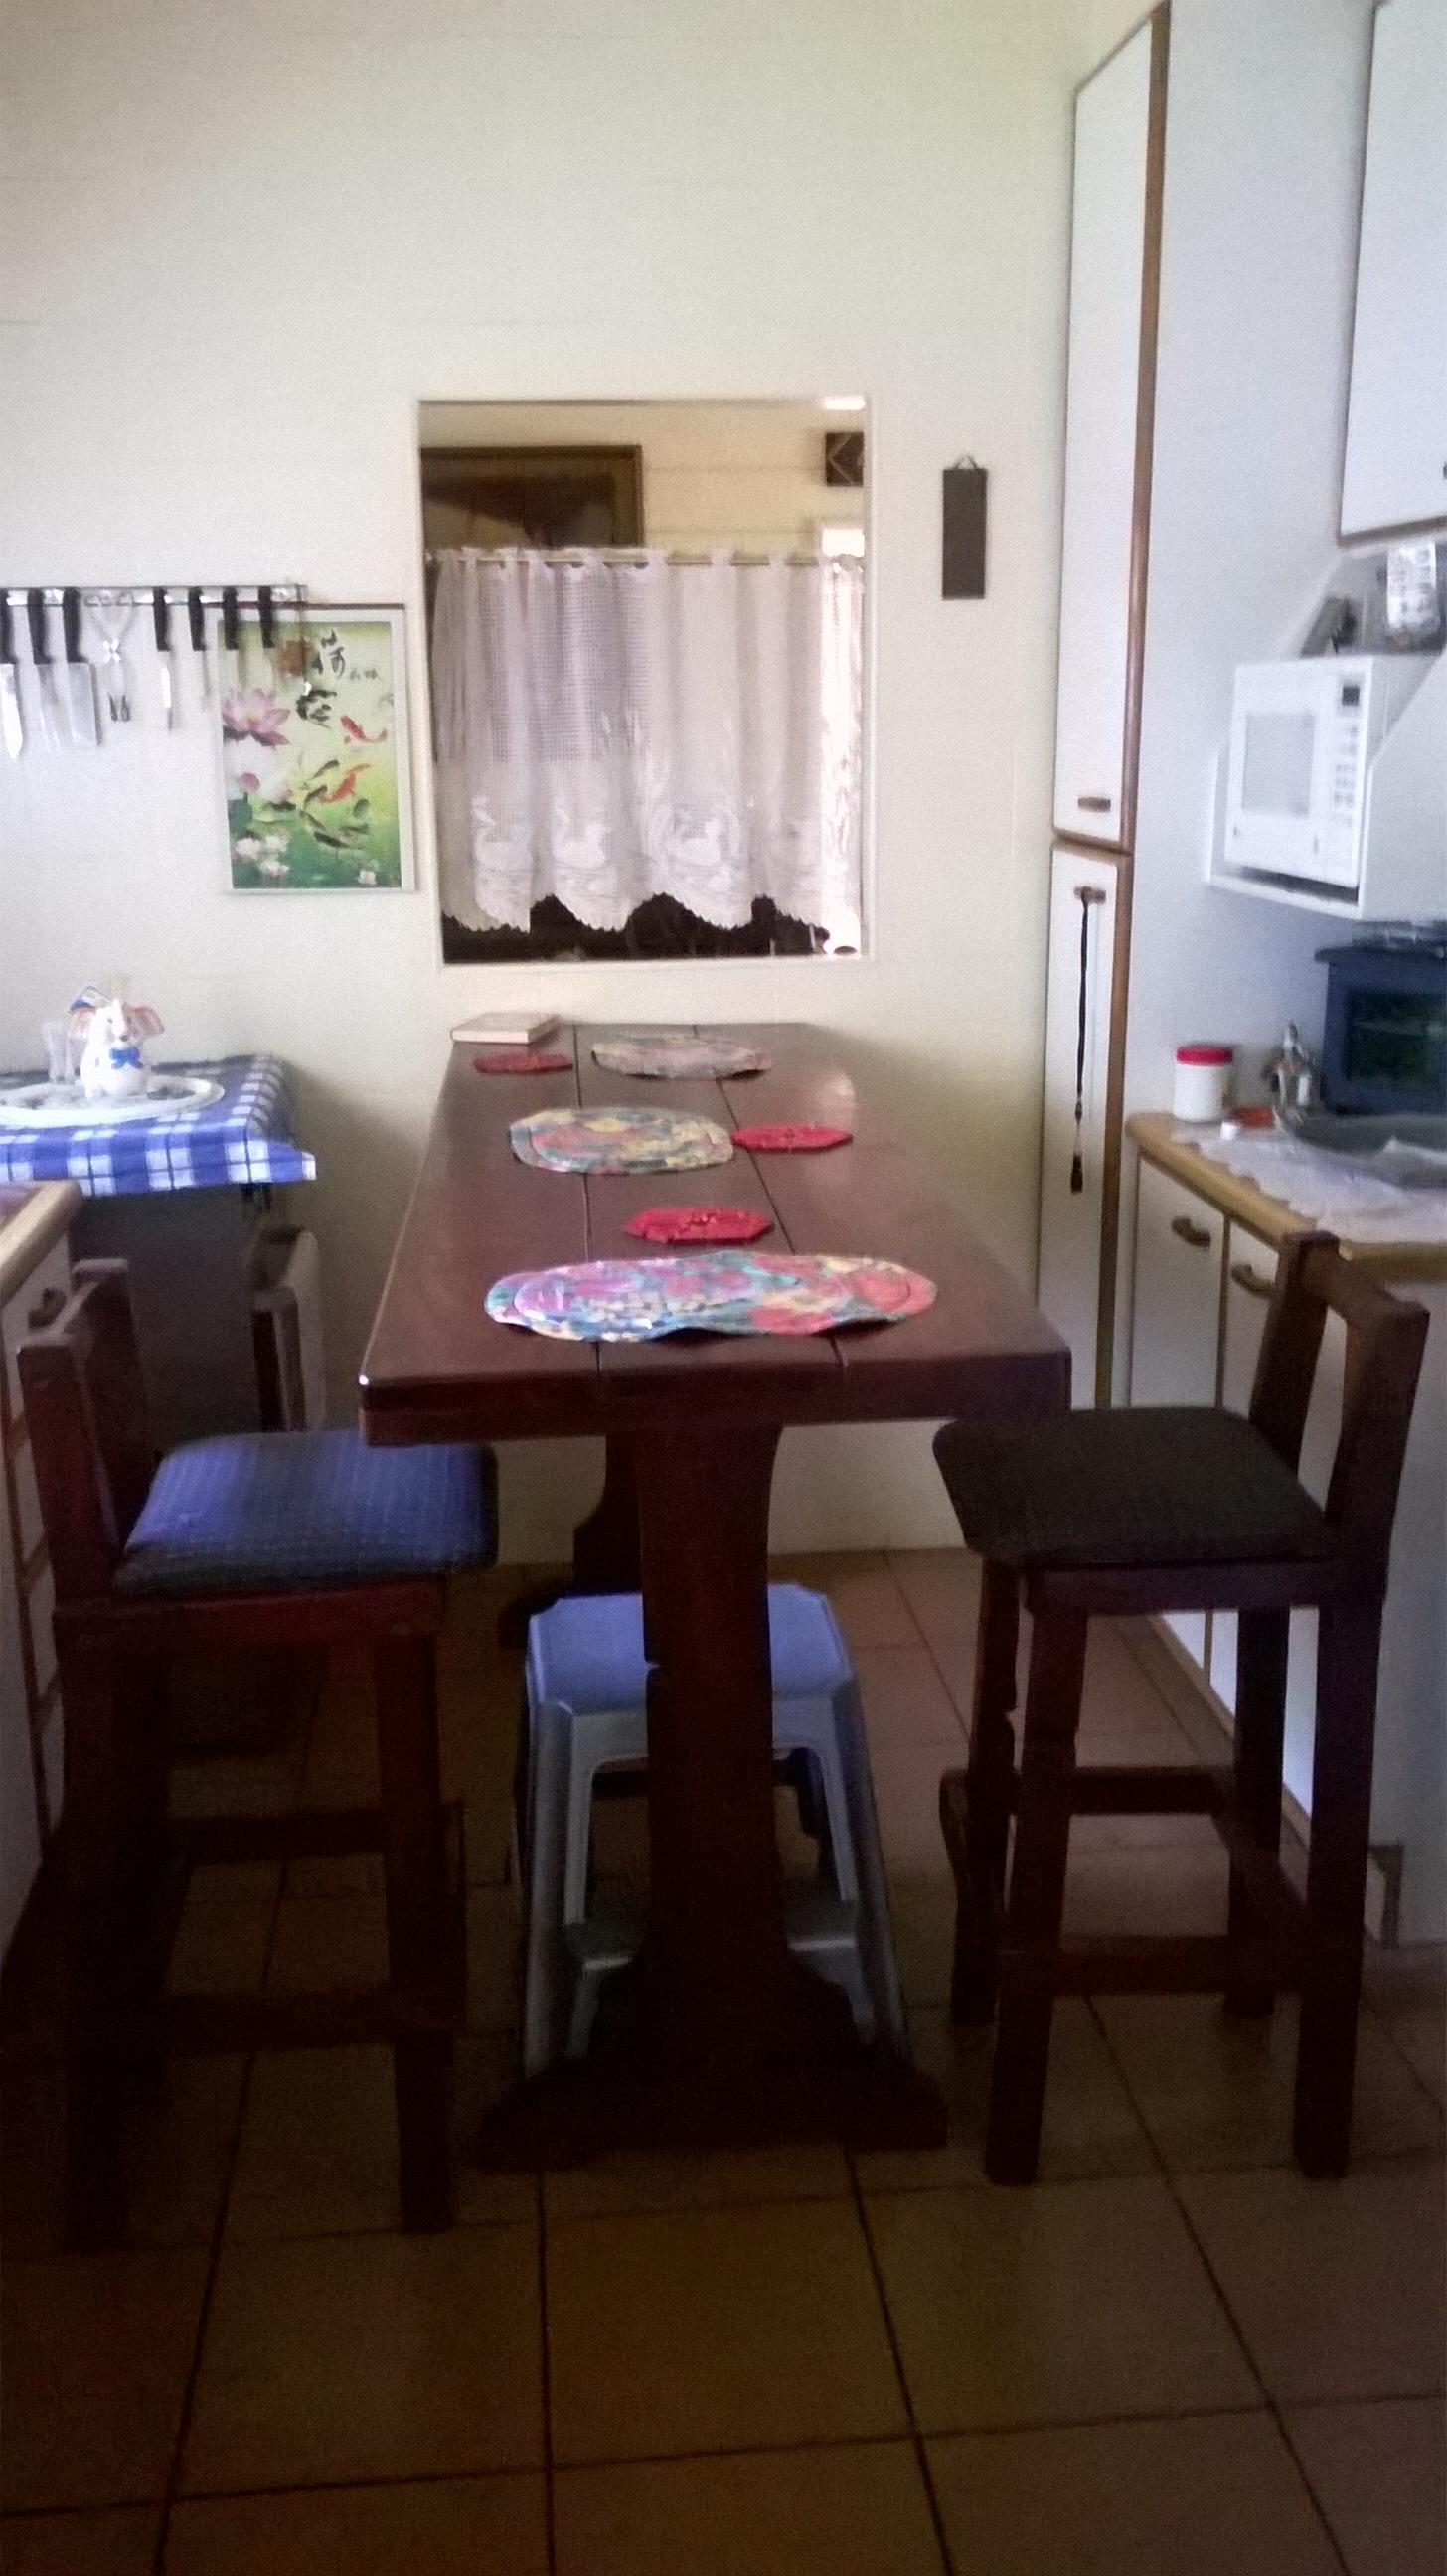 Mozambiqain Bar, with 6 matching bar stools